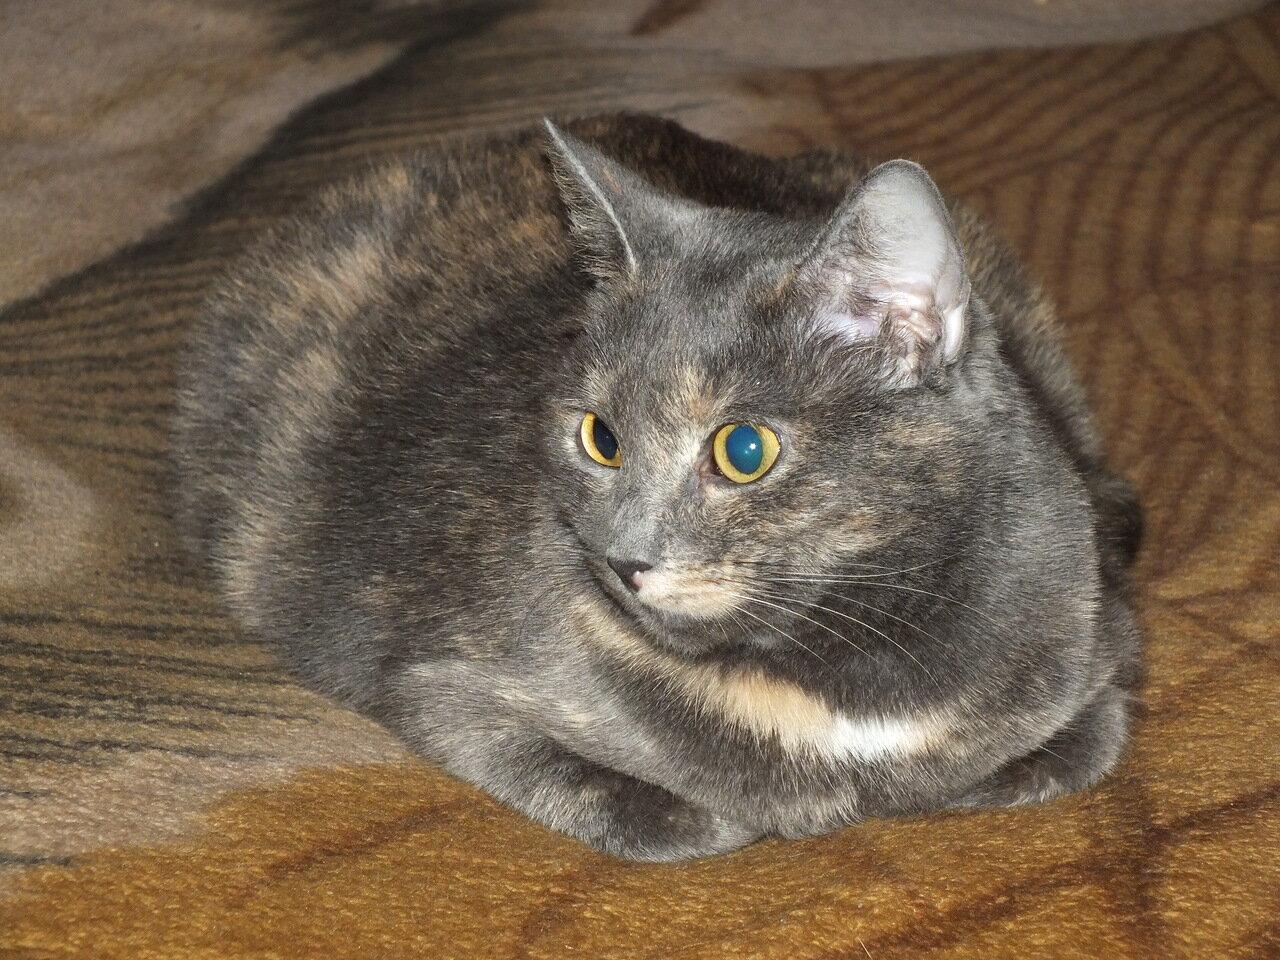 Муся. Кошко диванное.